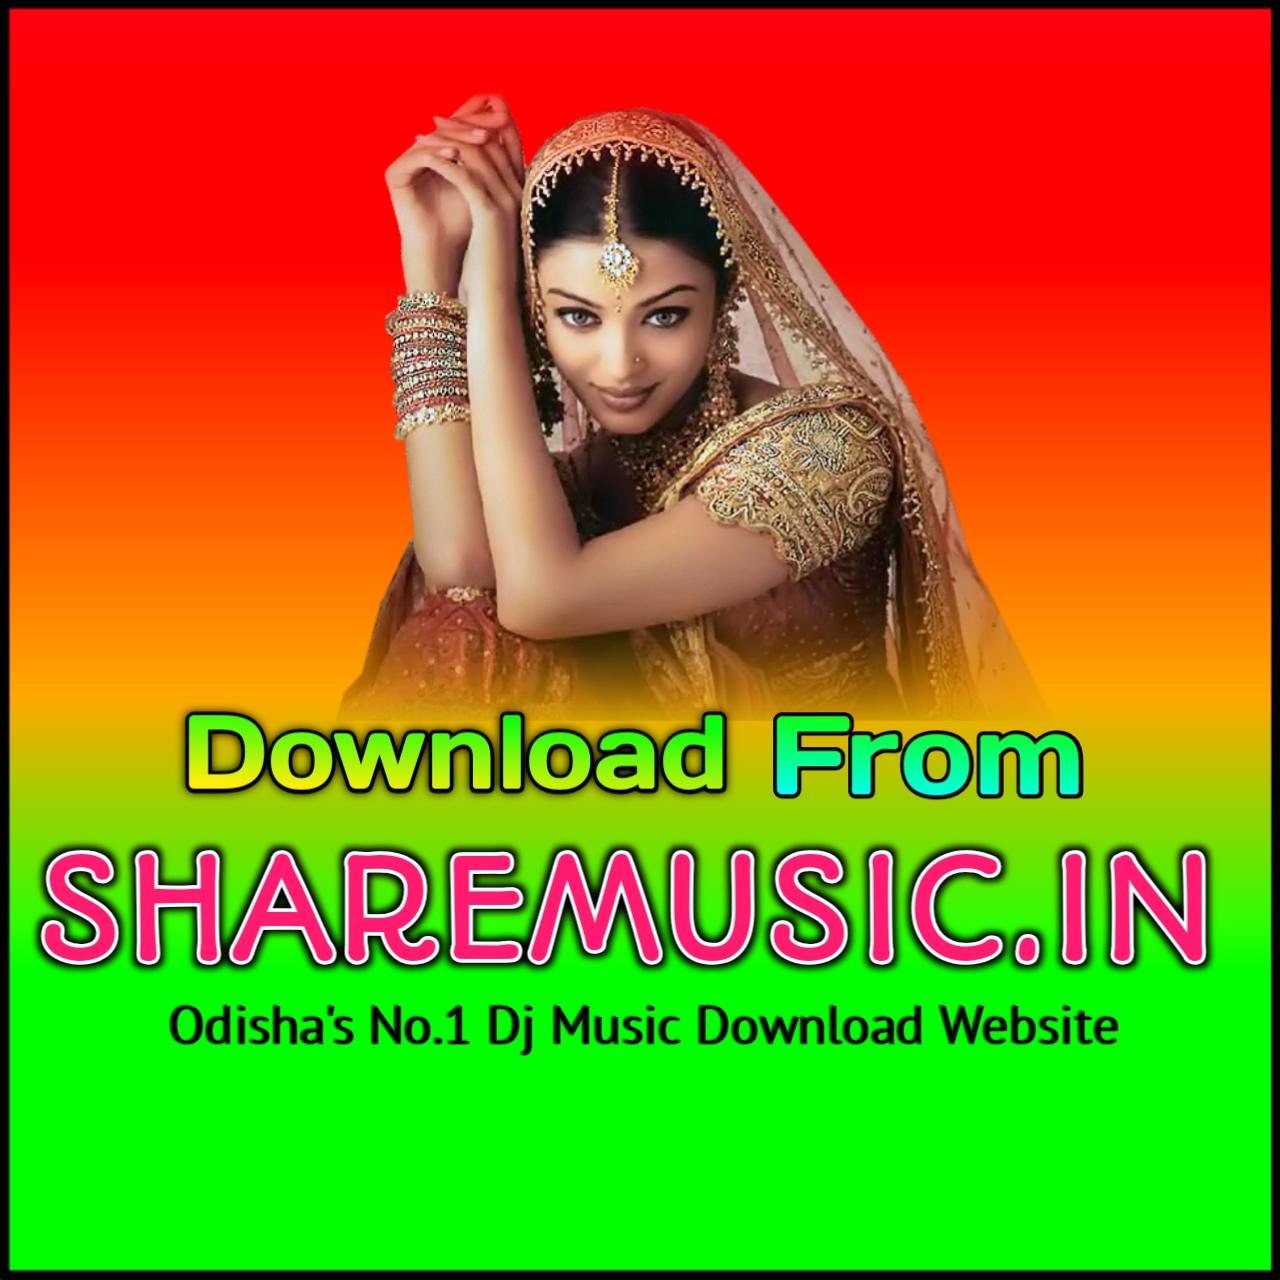 Jay Jay Jagannath (Rework Bhajan Mix) Dj Deepak Prince